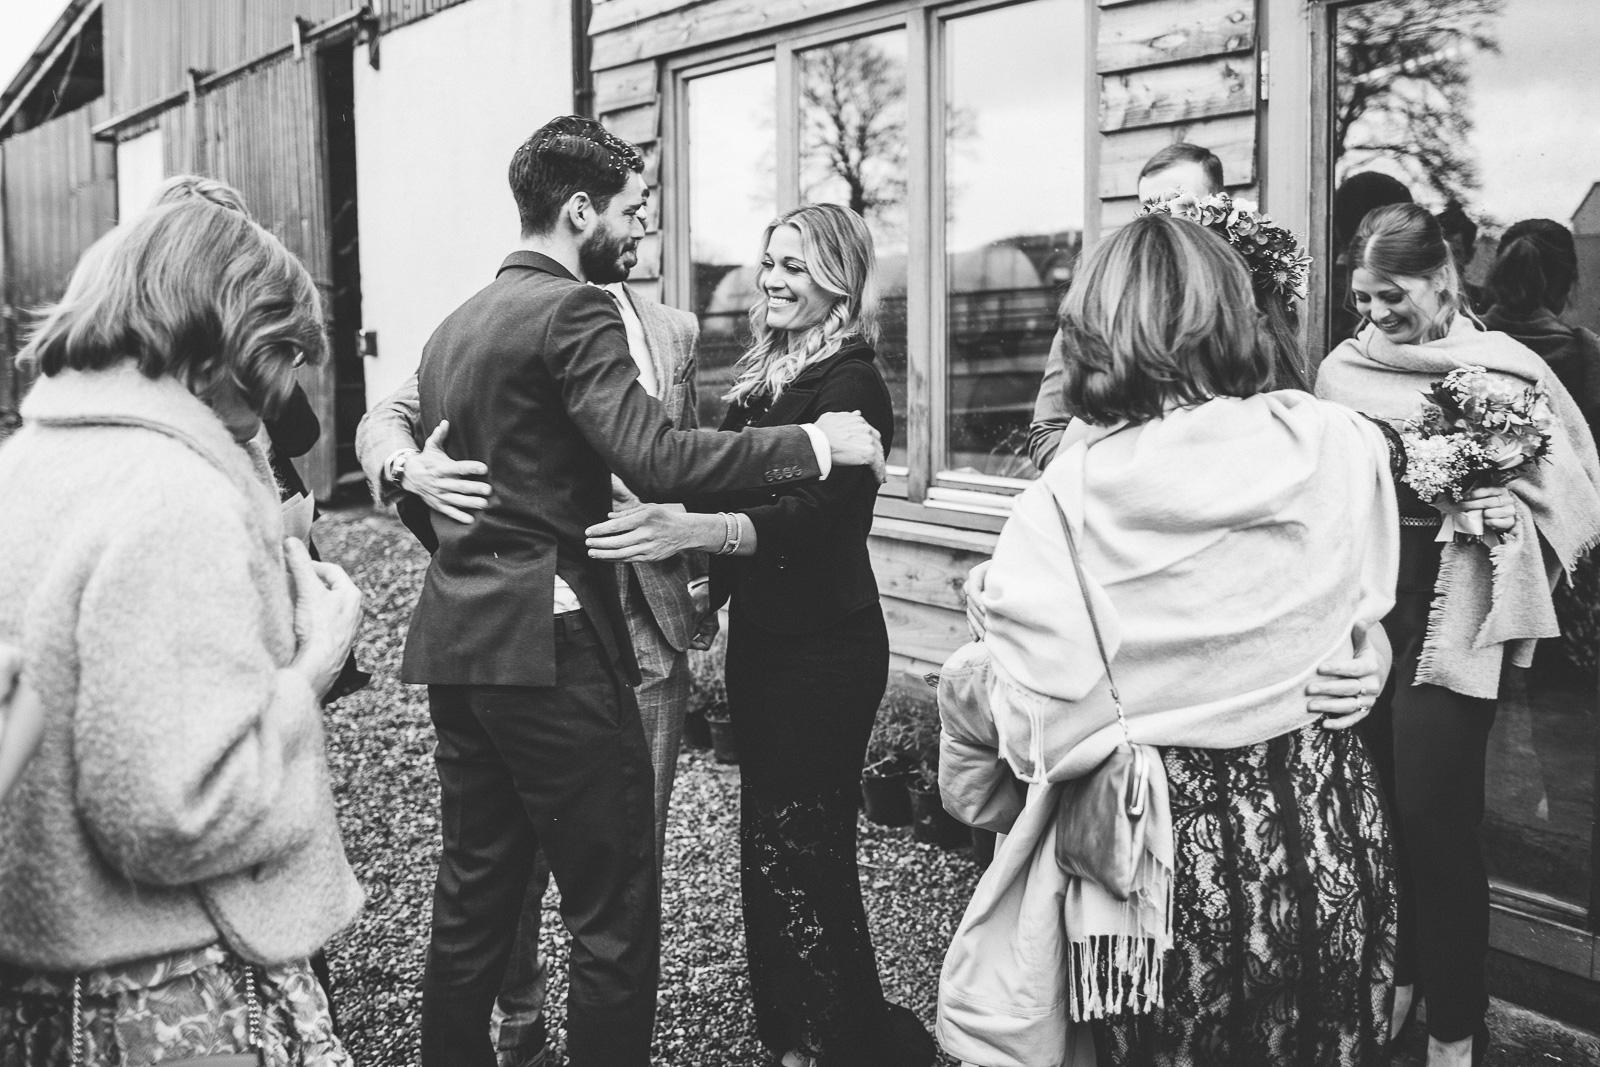 Cloughjordan+Weddings+Ireland.39.JPG